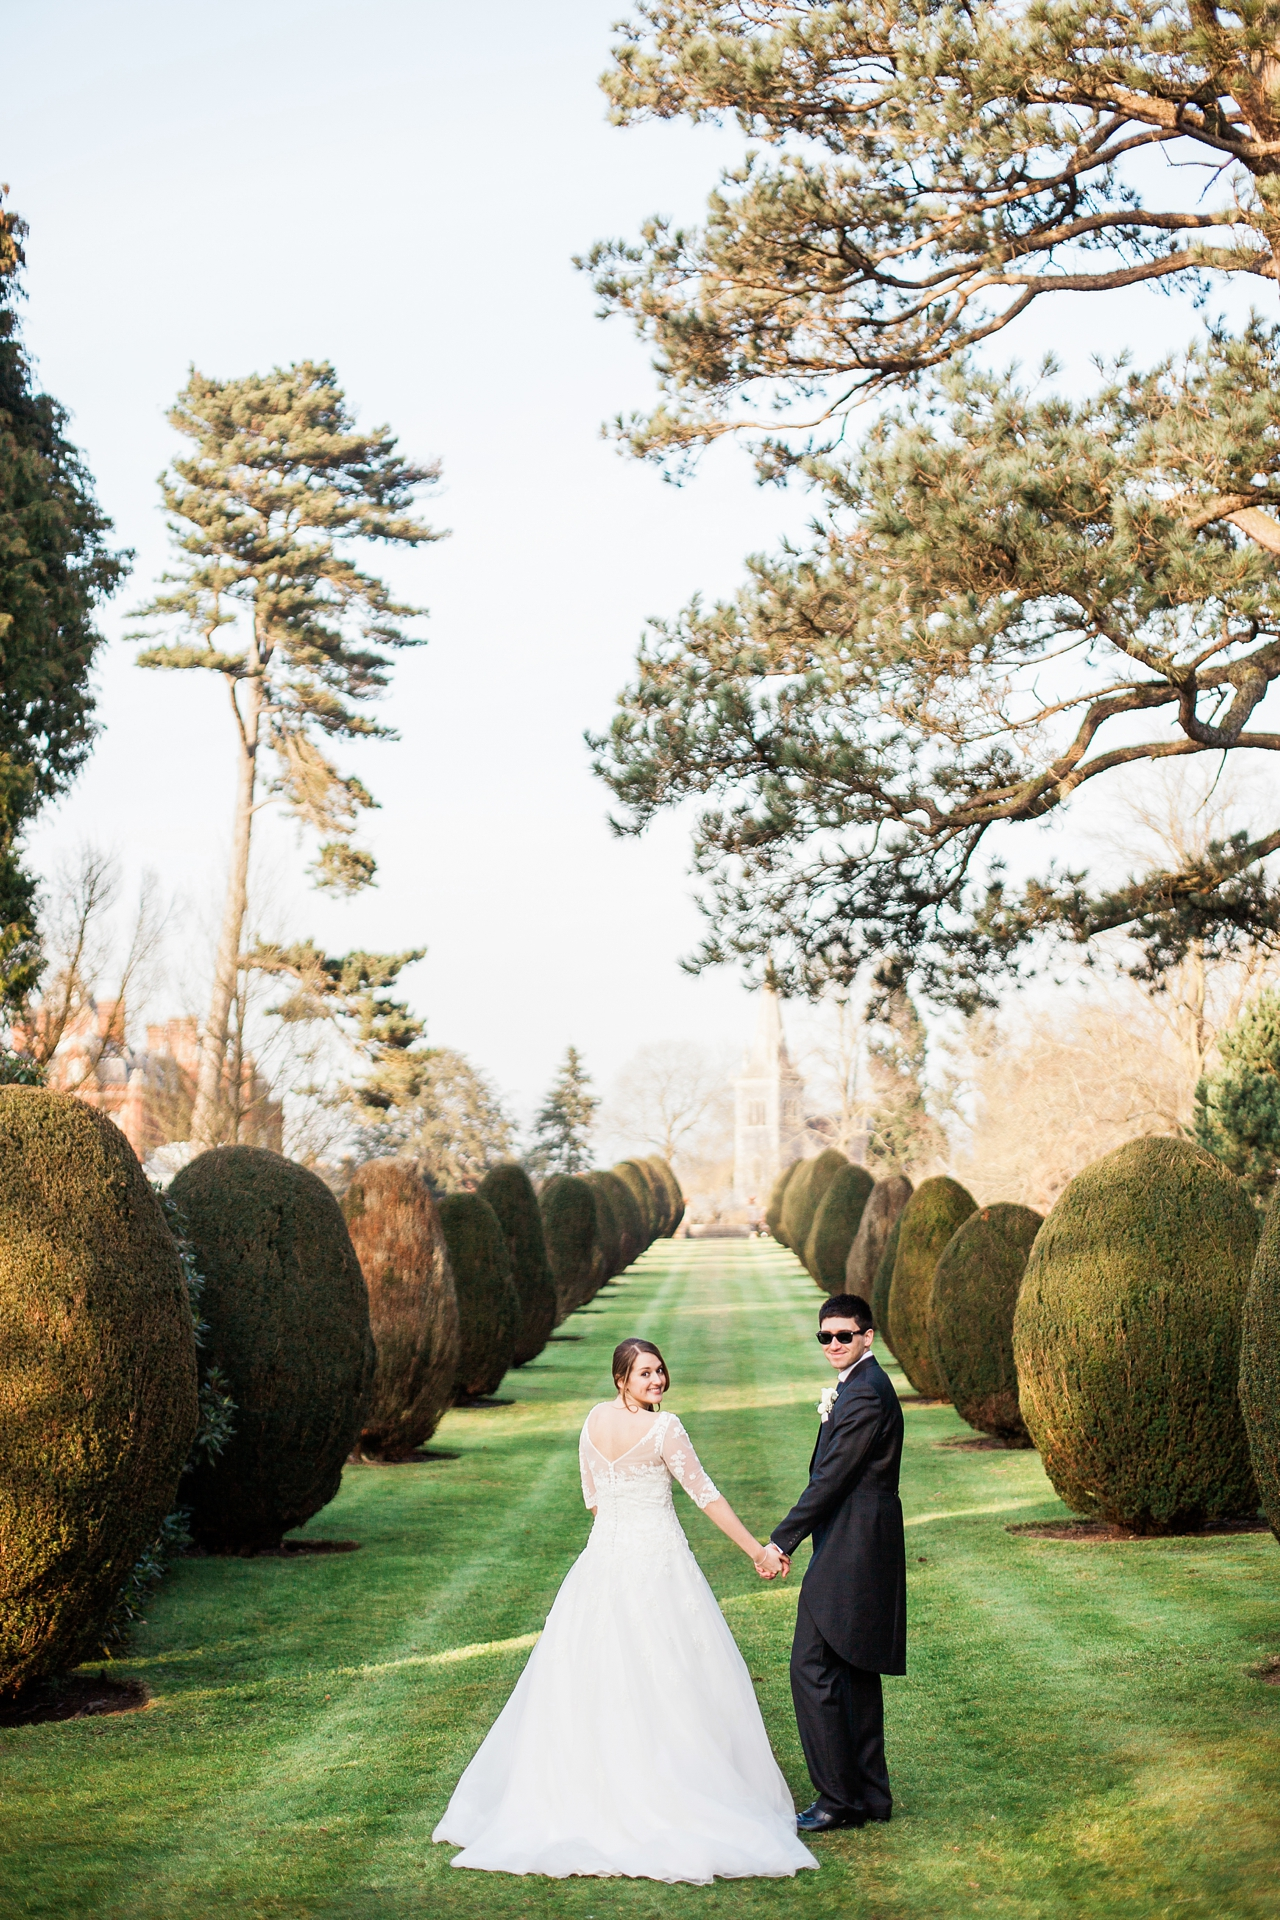 Helen & Adam Spring Wedding at The Elvetham Hotel, Hampshire